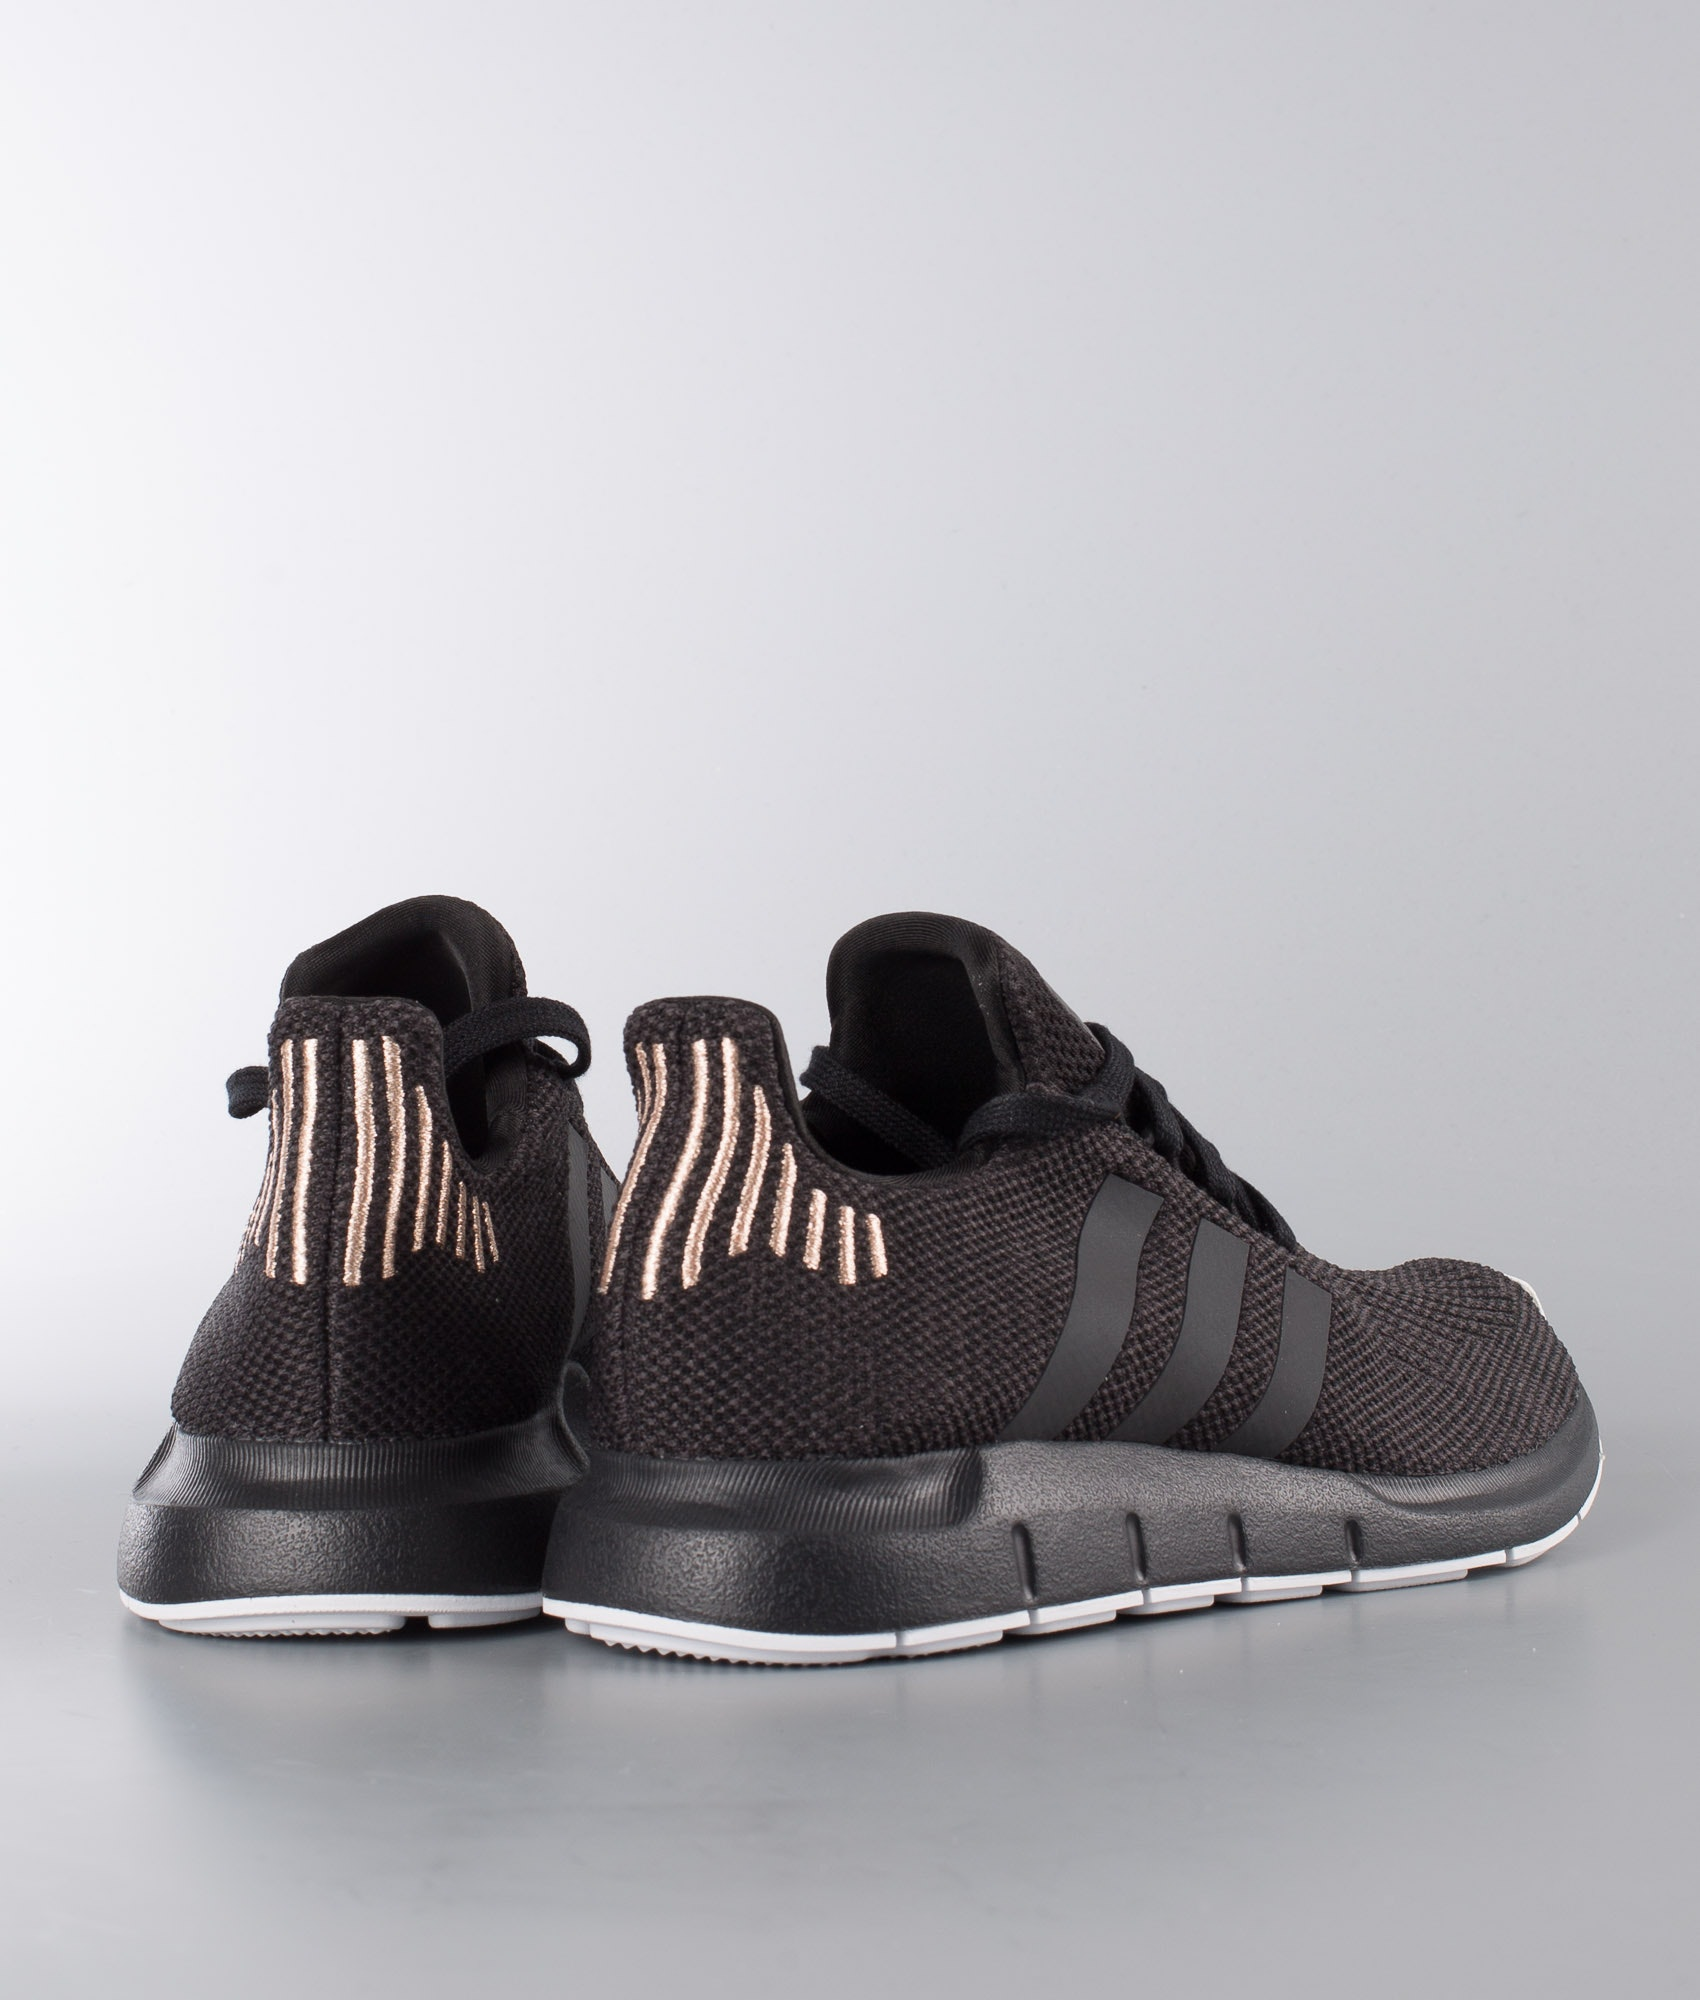 Adidas Originals Swift Run W Shoes Core Black Carbon Ftwr White